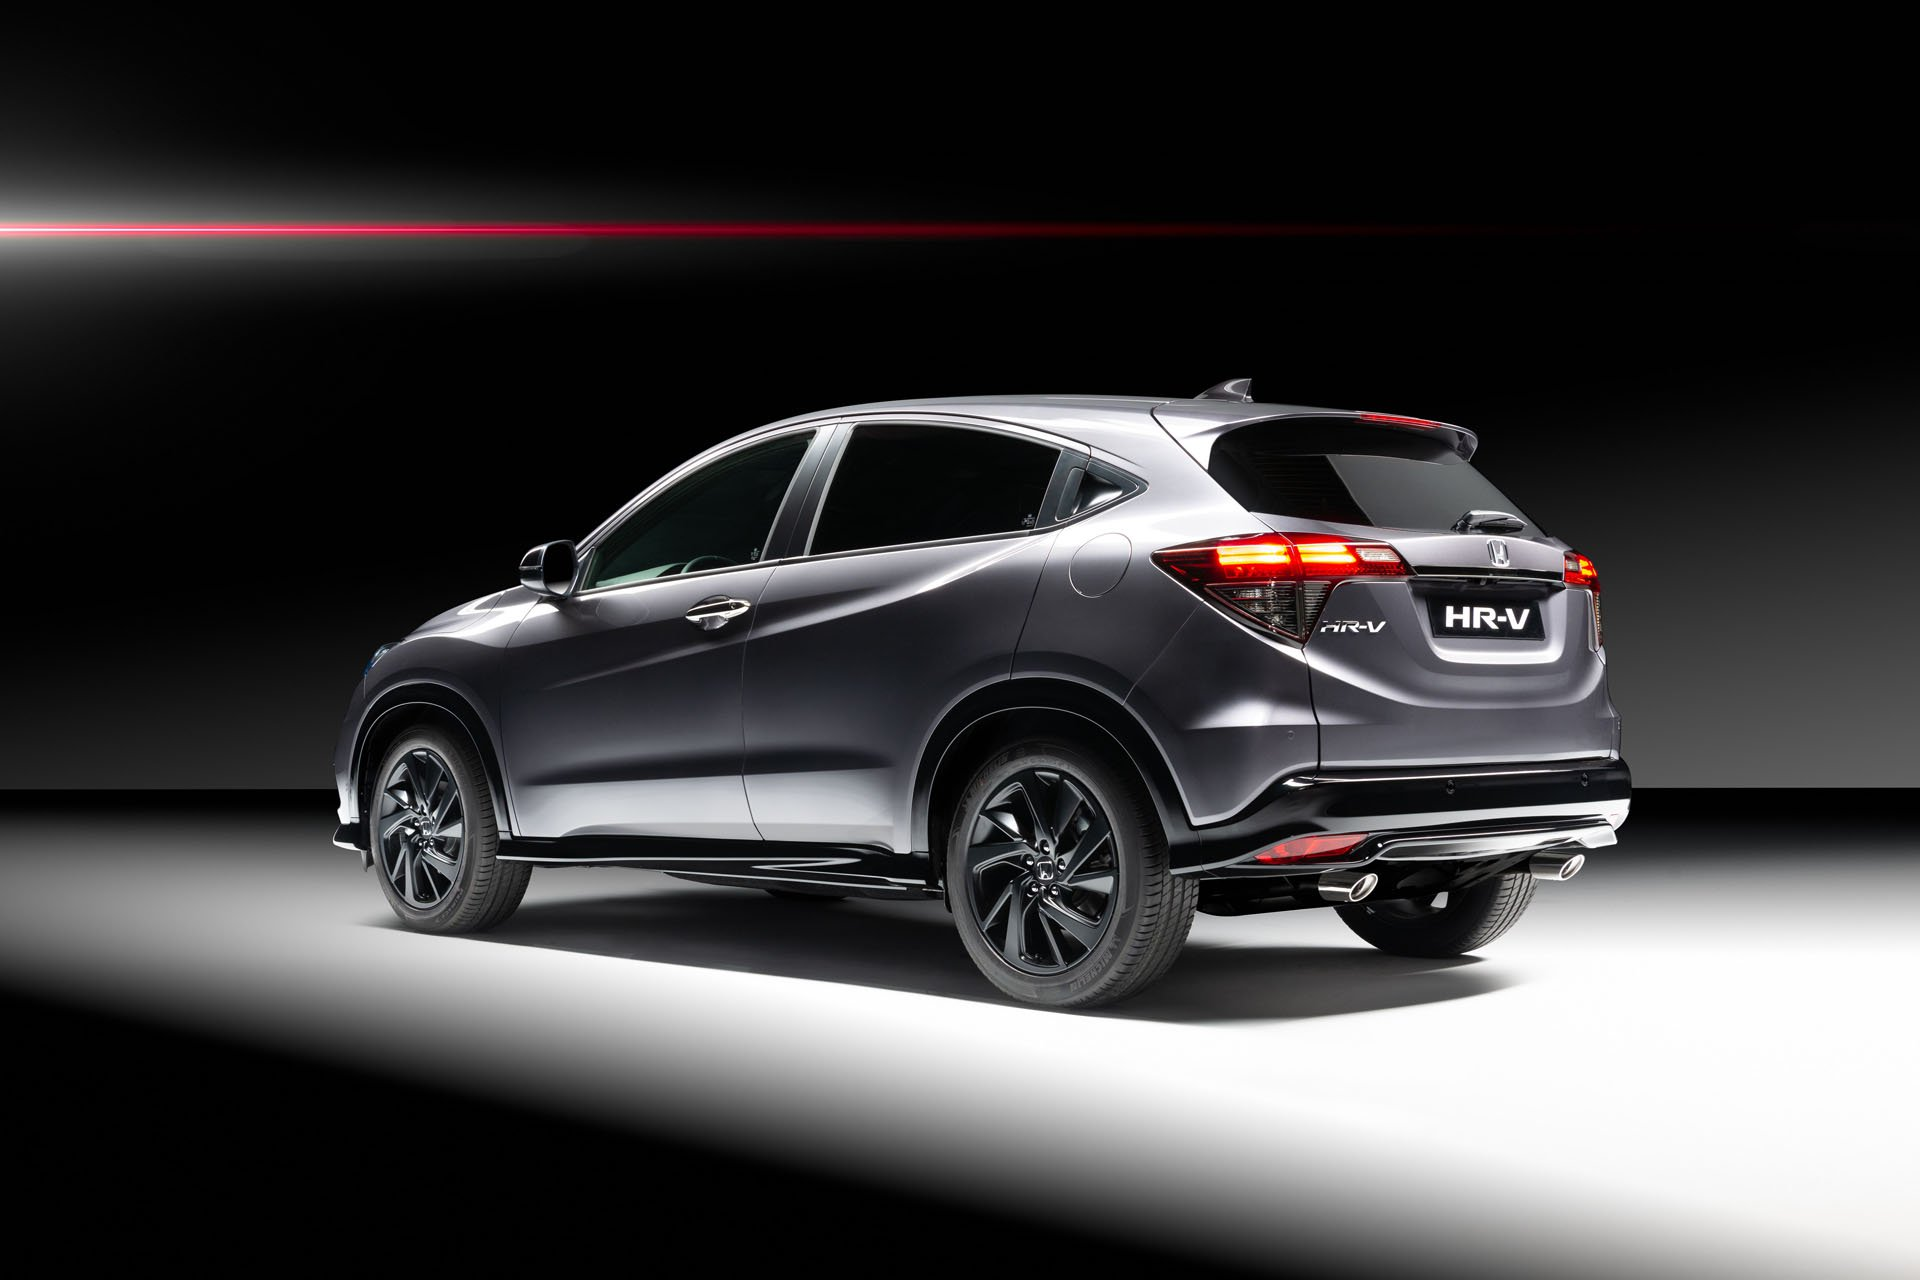 Honda HR V Sport Gets 15L VTEC Turbo Engine With 182 HP